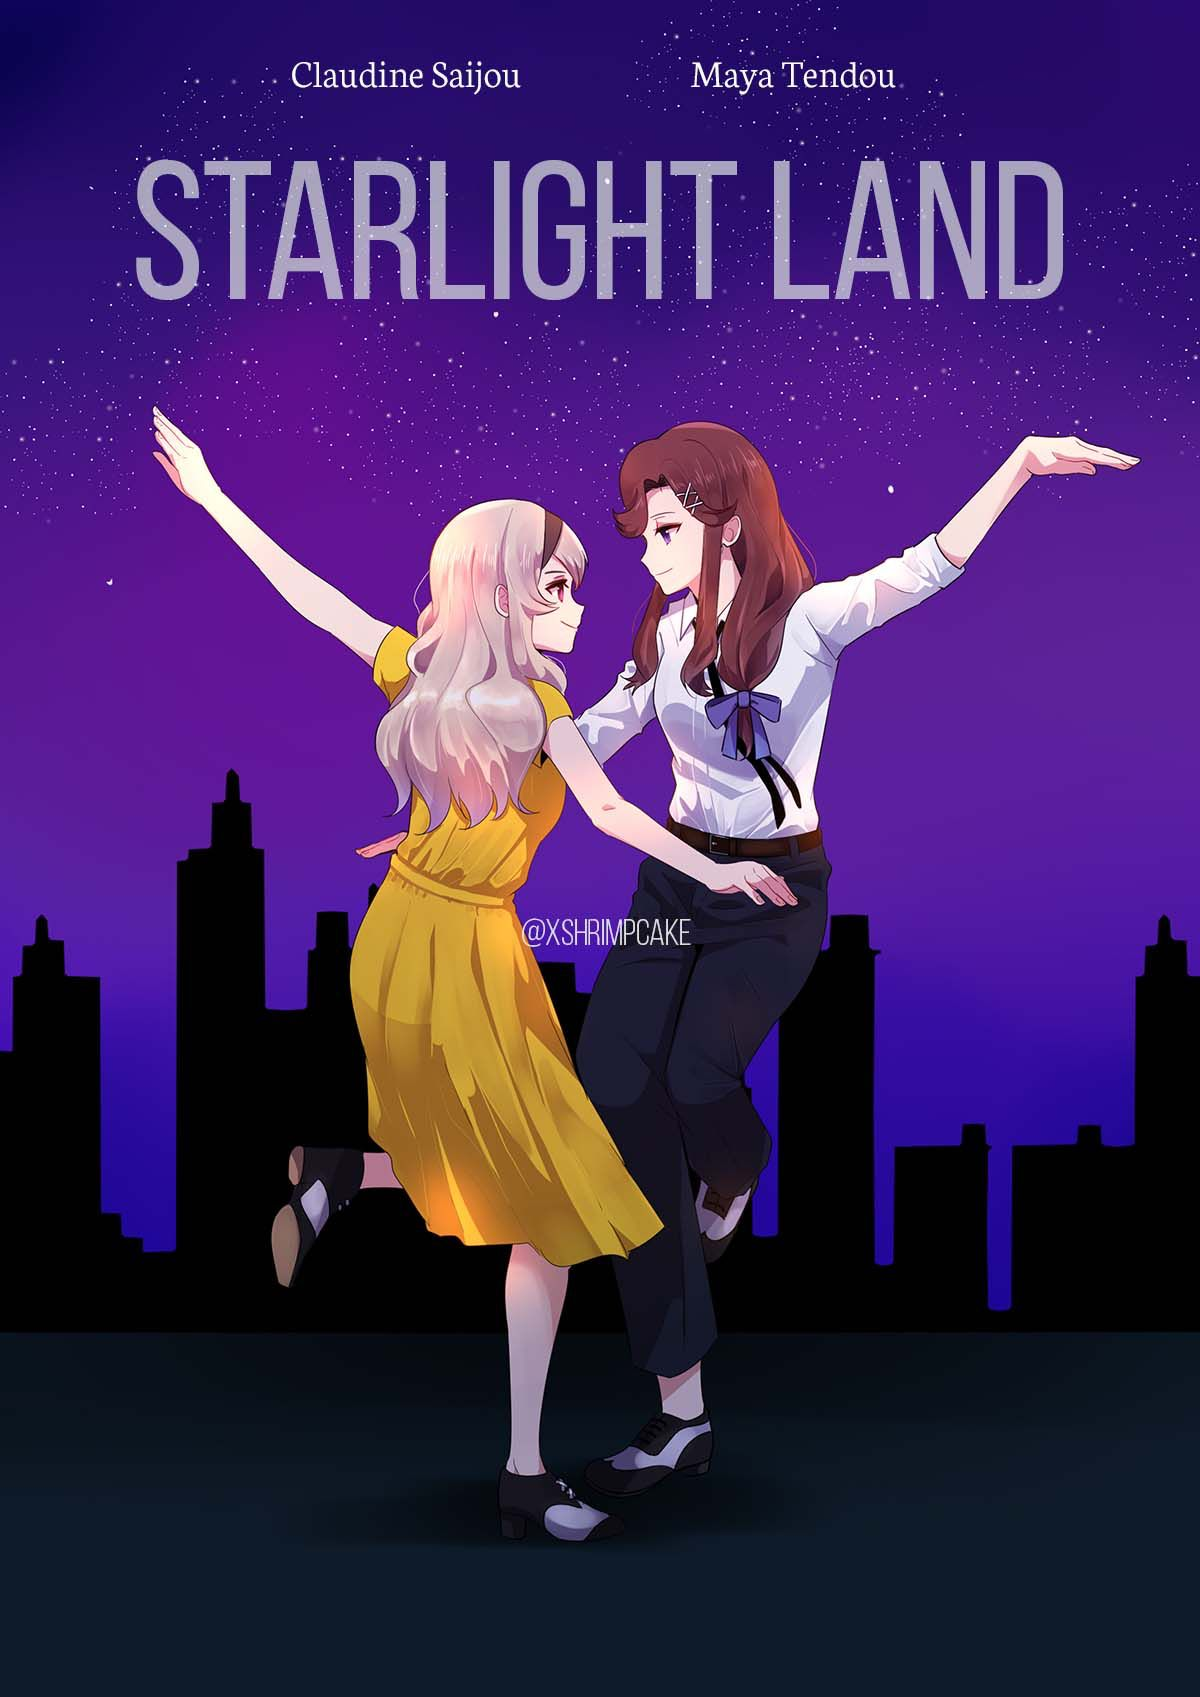 Pin by Becca on revue starlight Yuri anime, Anime